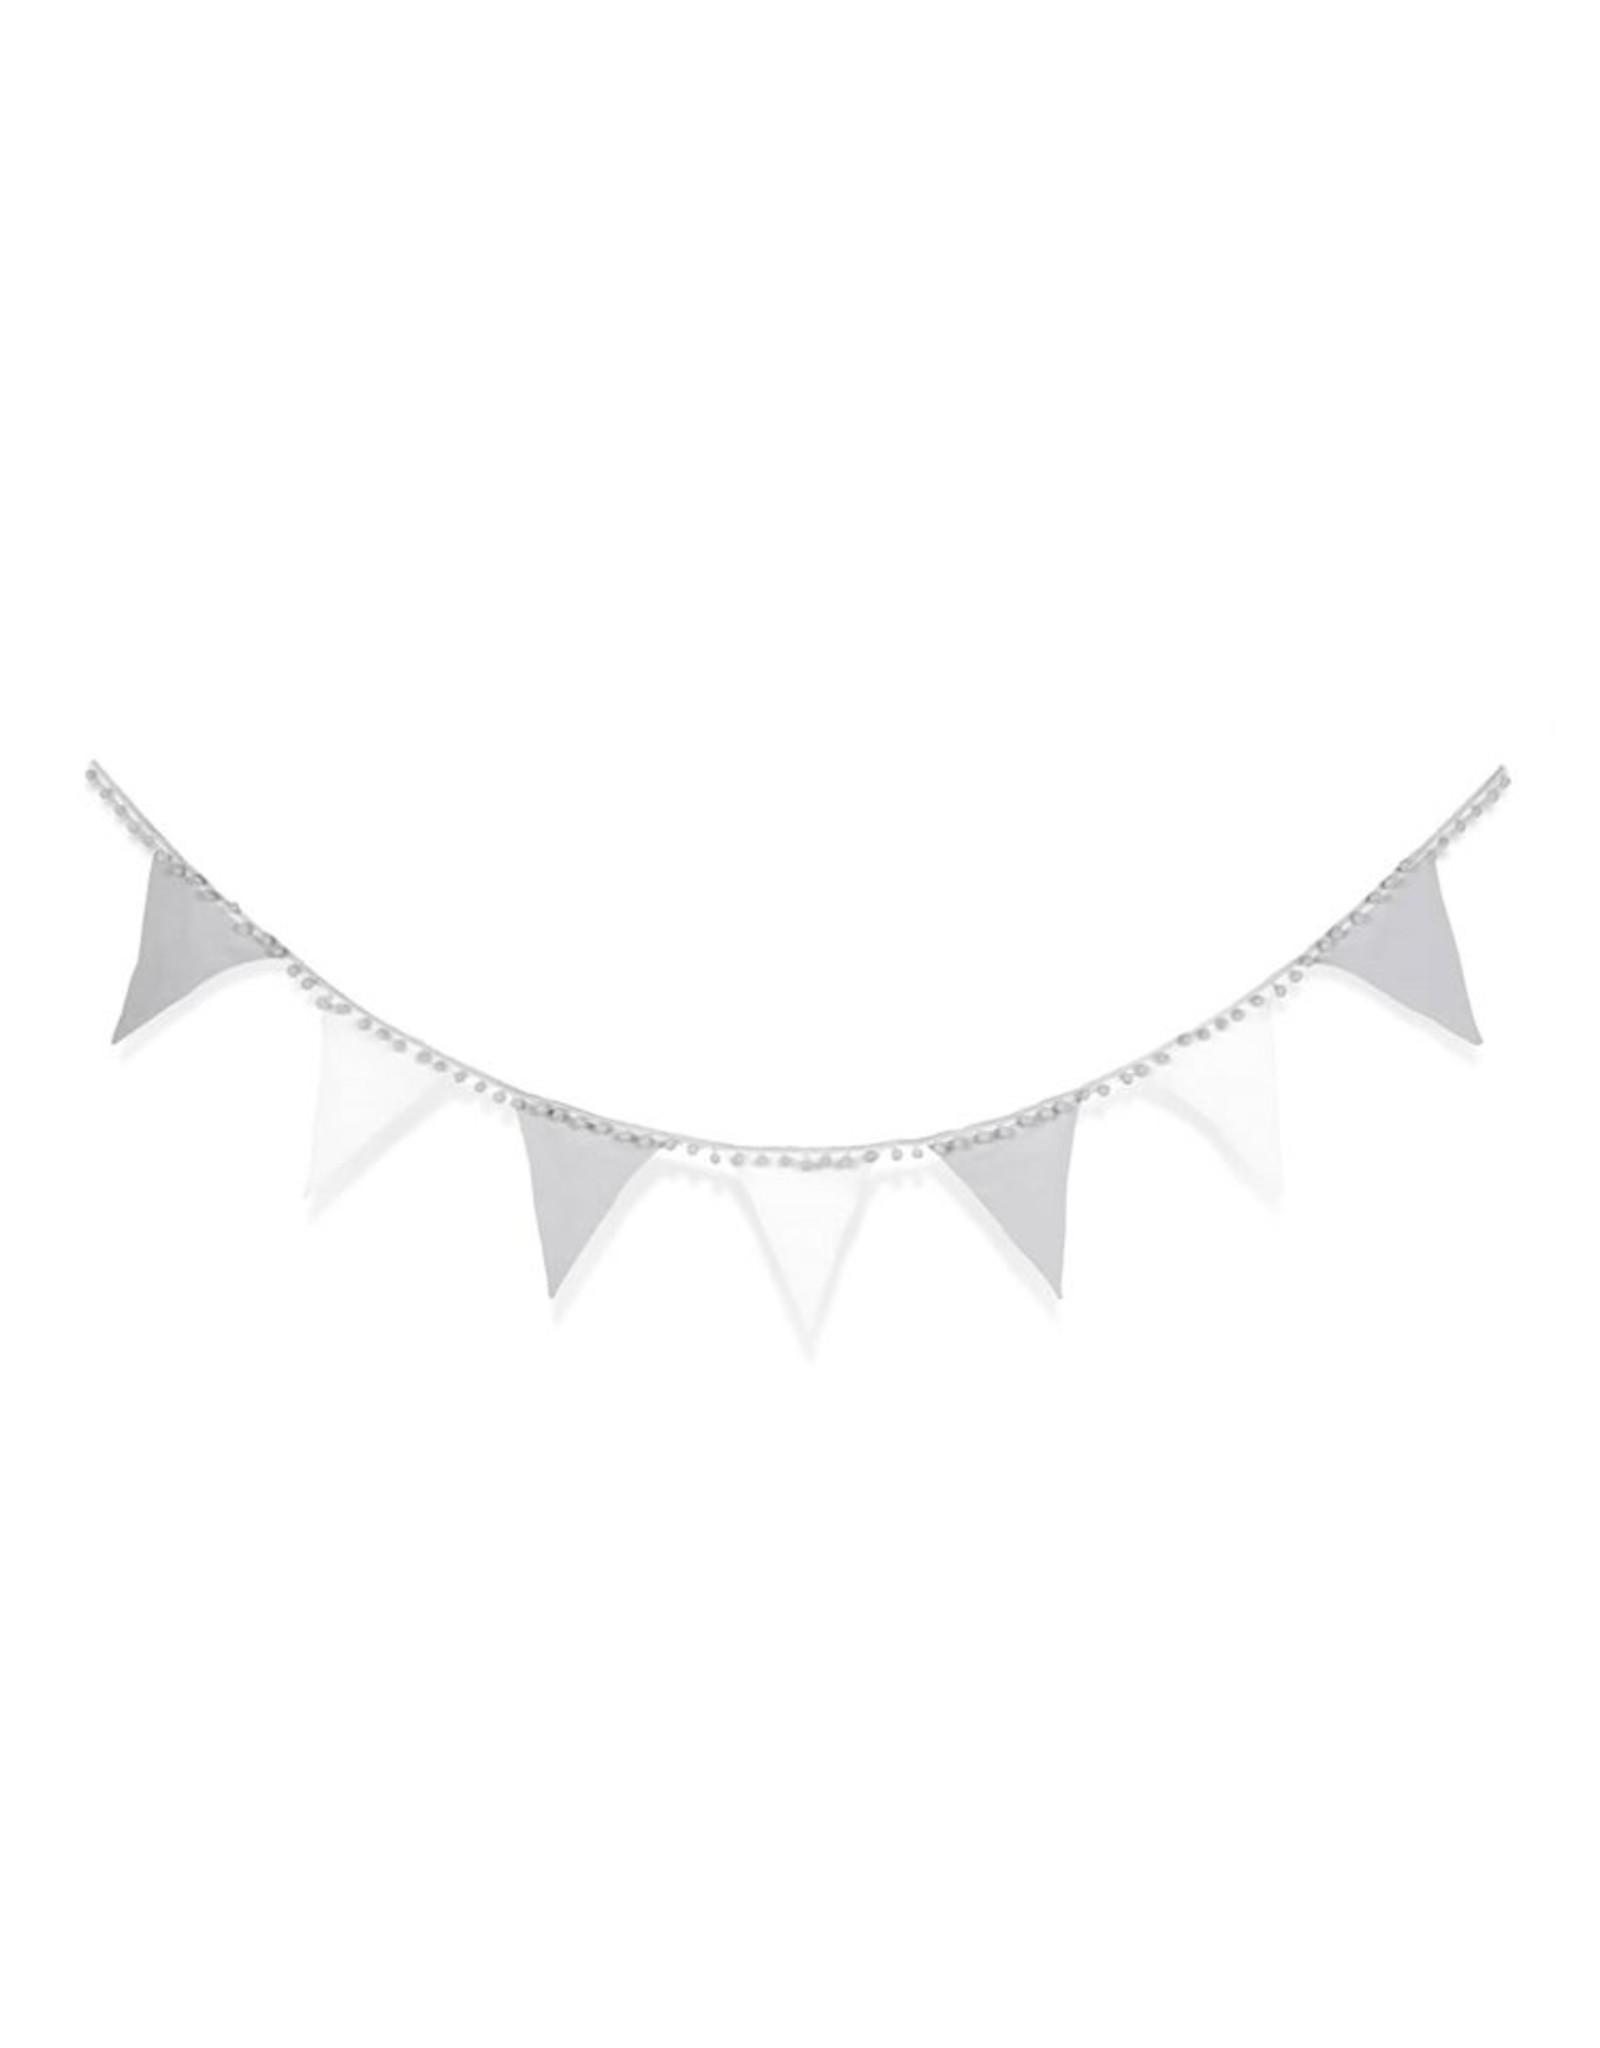 Snuz Snuz Bunting- Grey and White